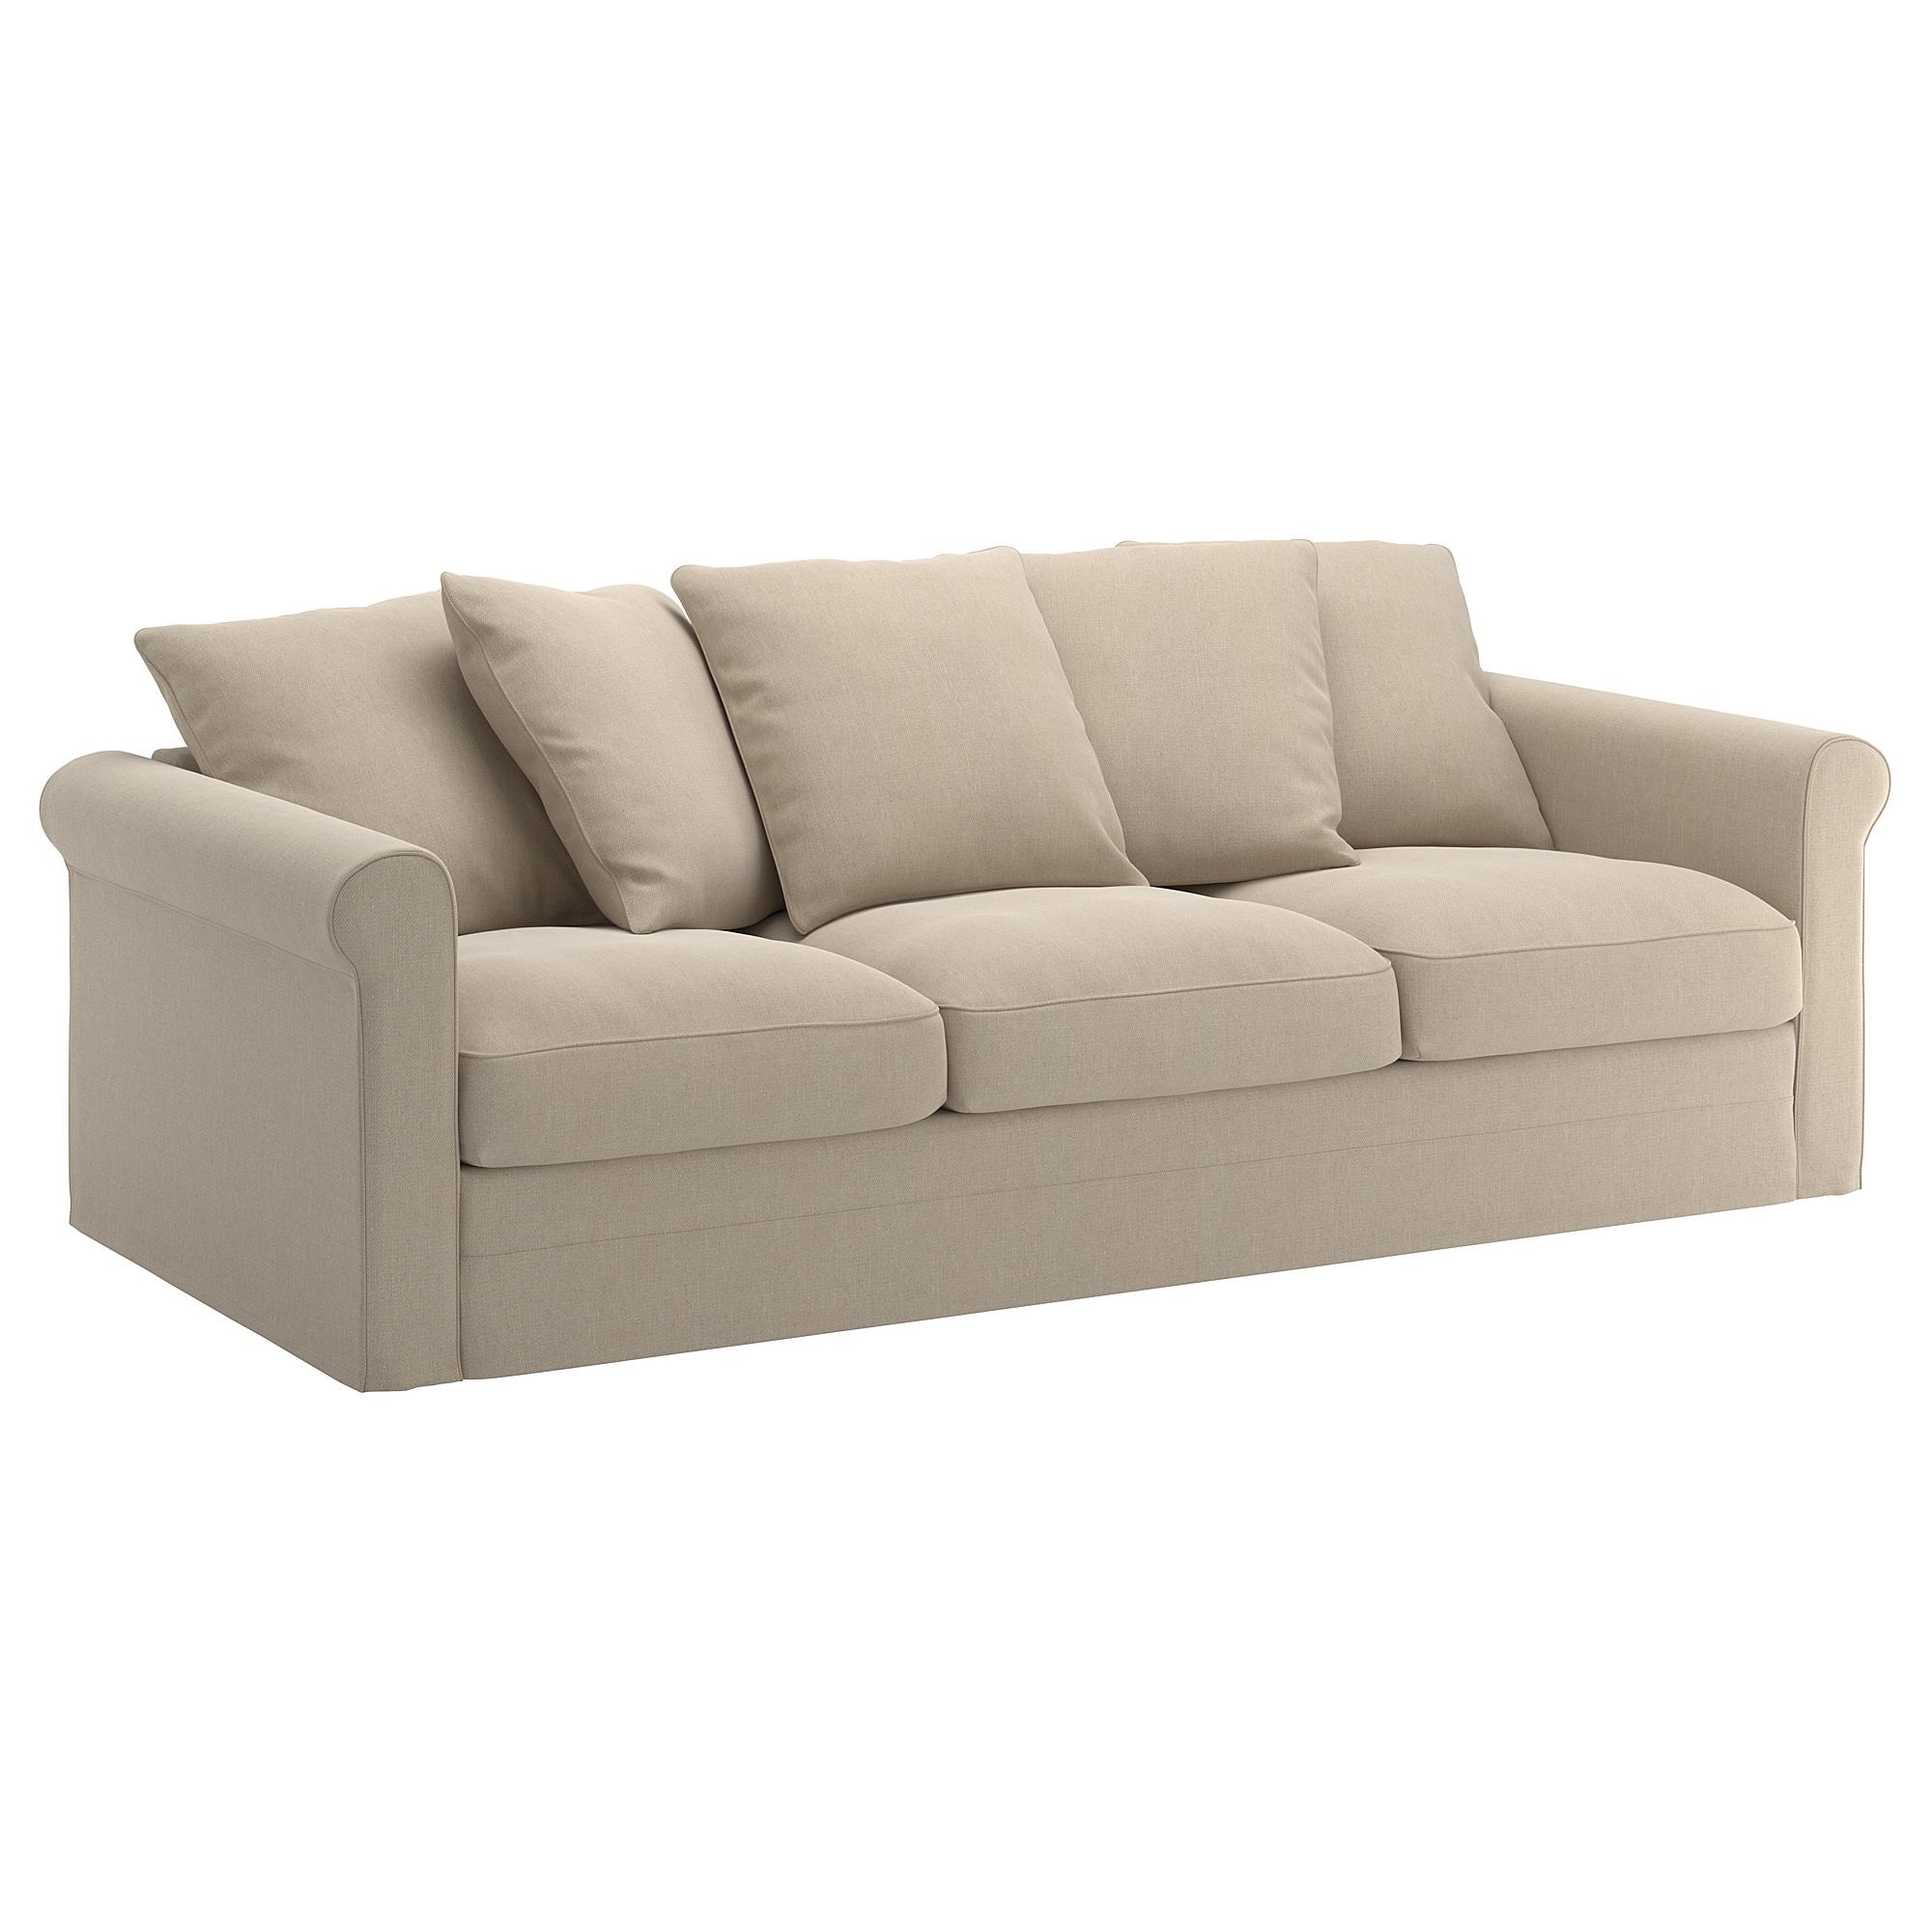 Sofas Tres Plazas Irdz Grà Nlid sofà 3 Plazas Sporda Natural Ikea